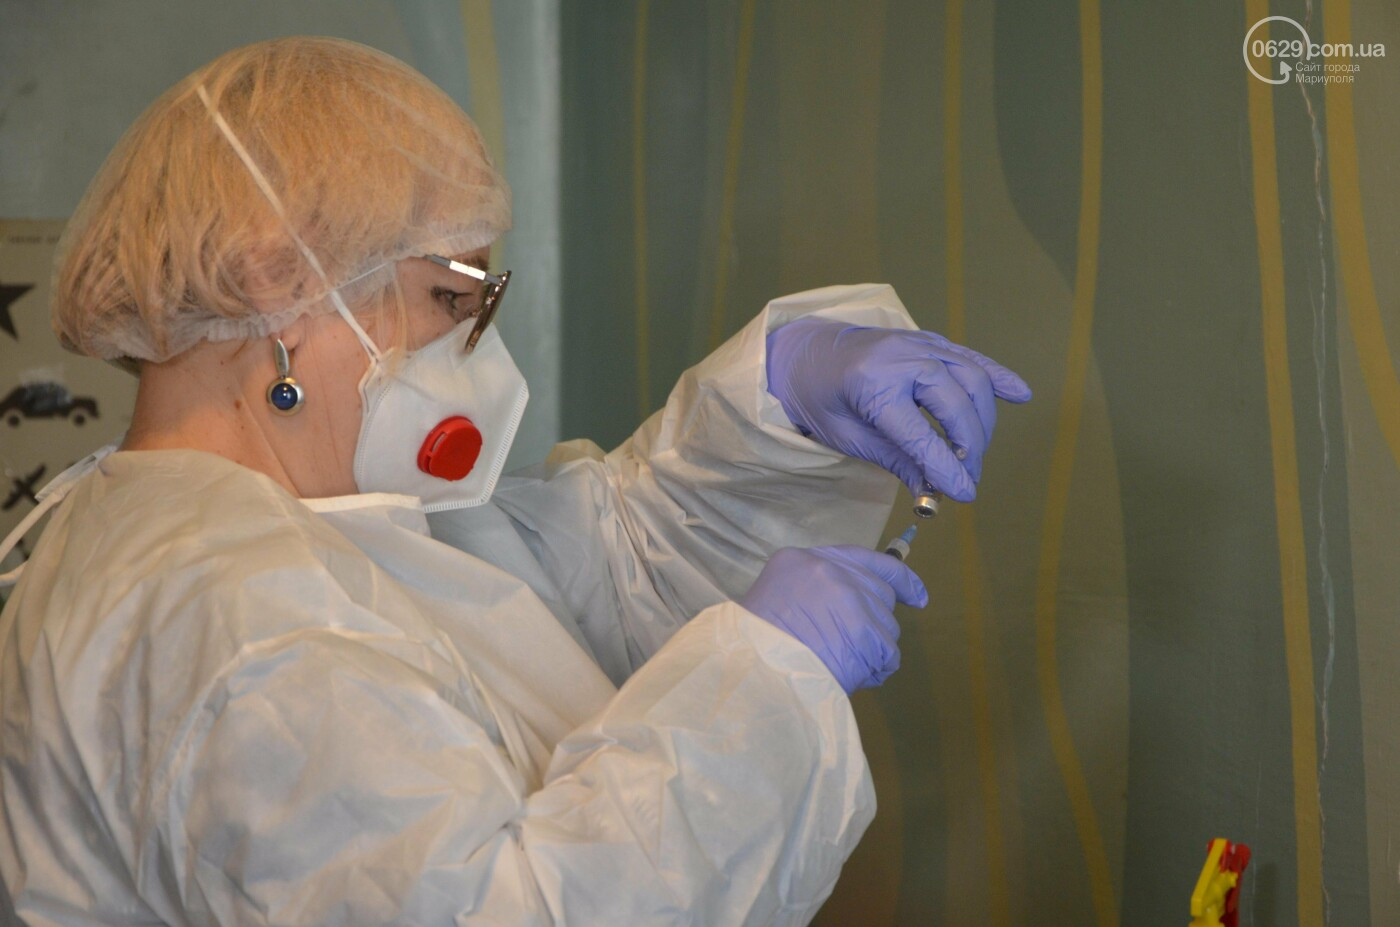 В Мариуполе сотрудники детского сада привились от коронавируса, - ФОТО, фото-3